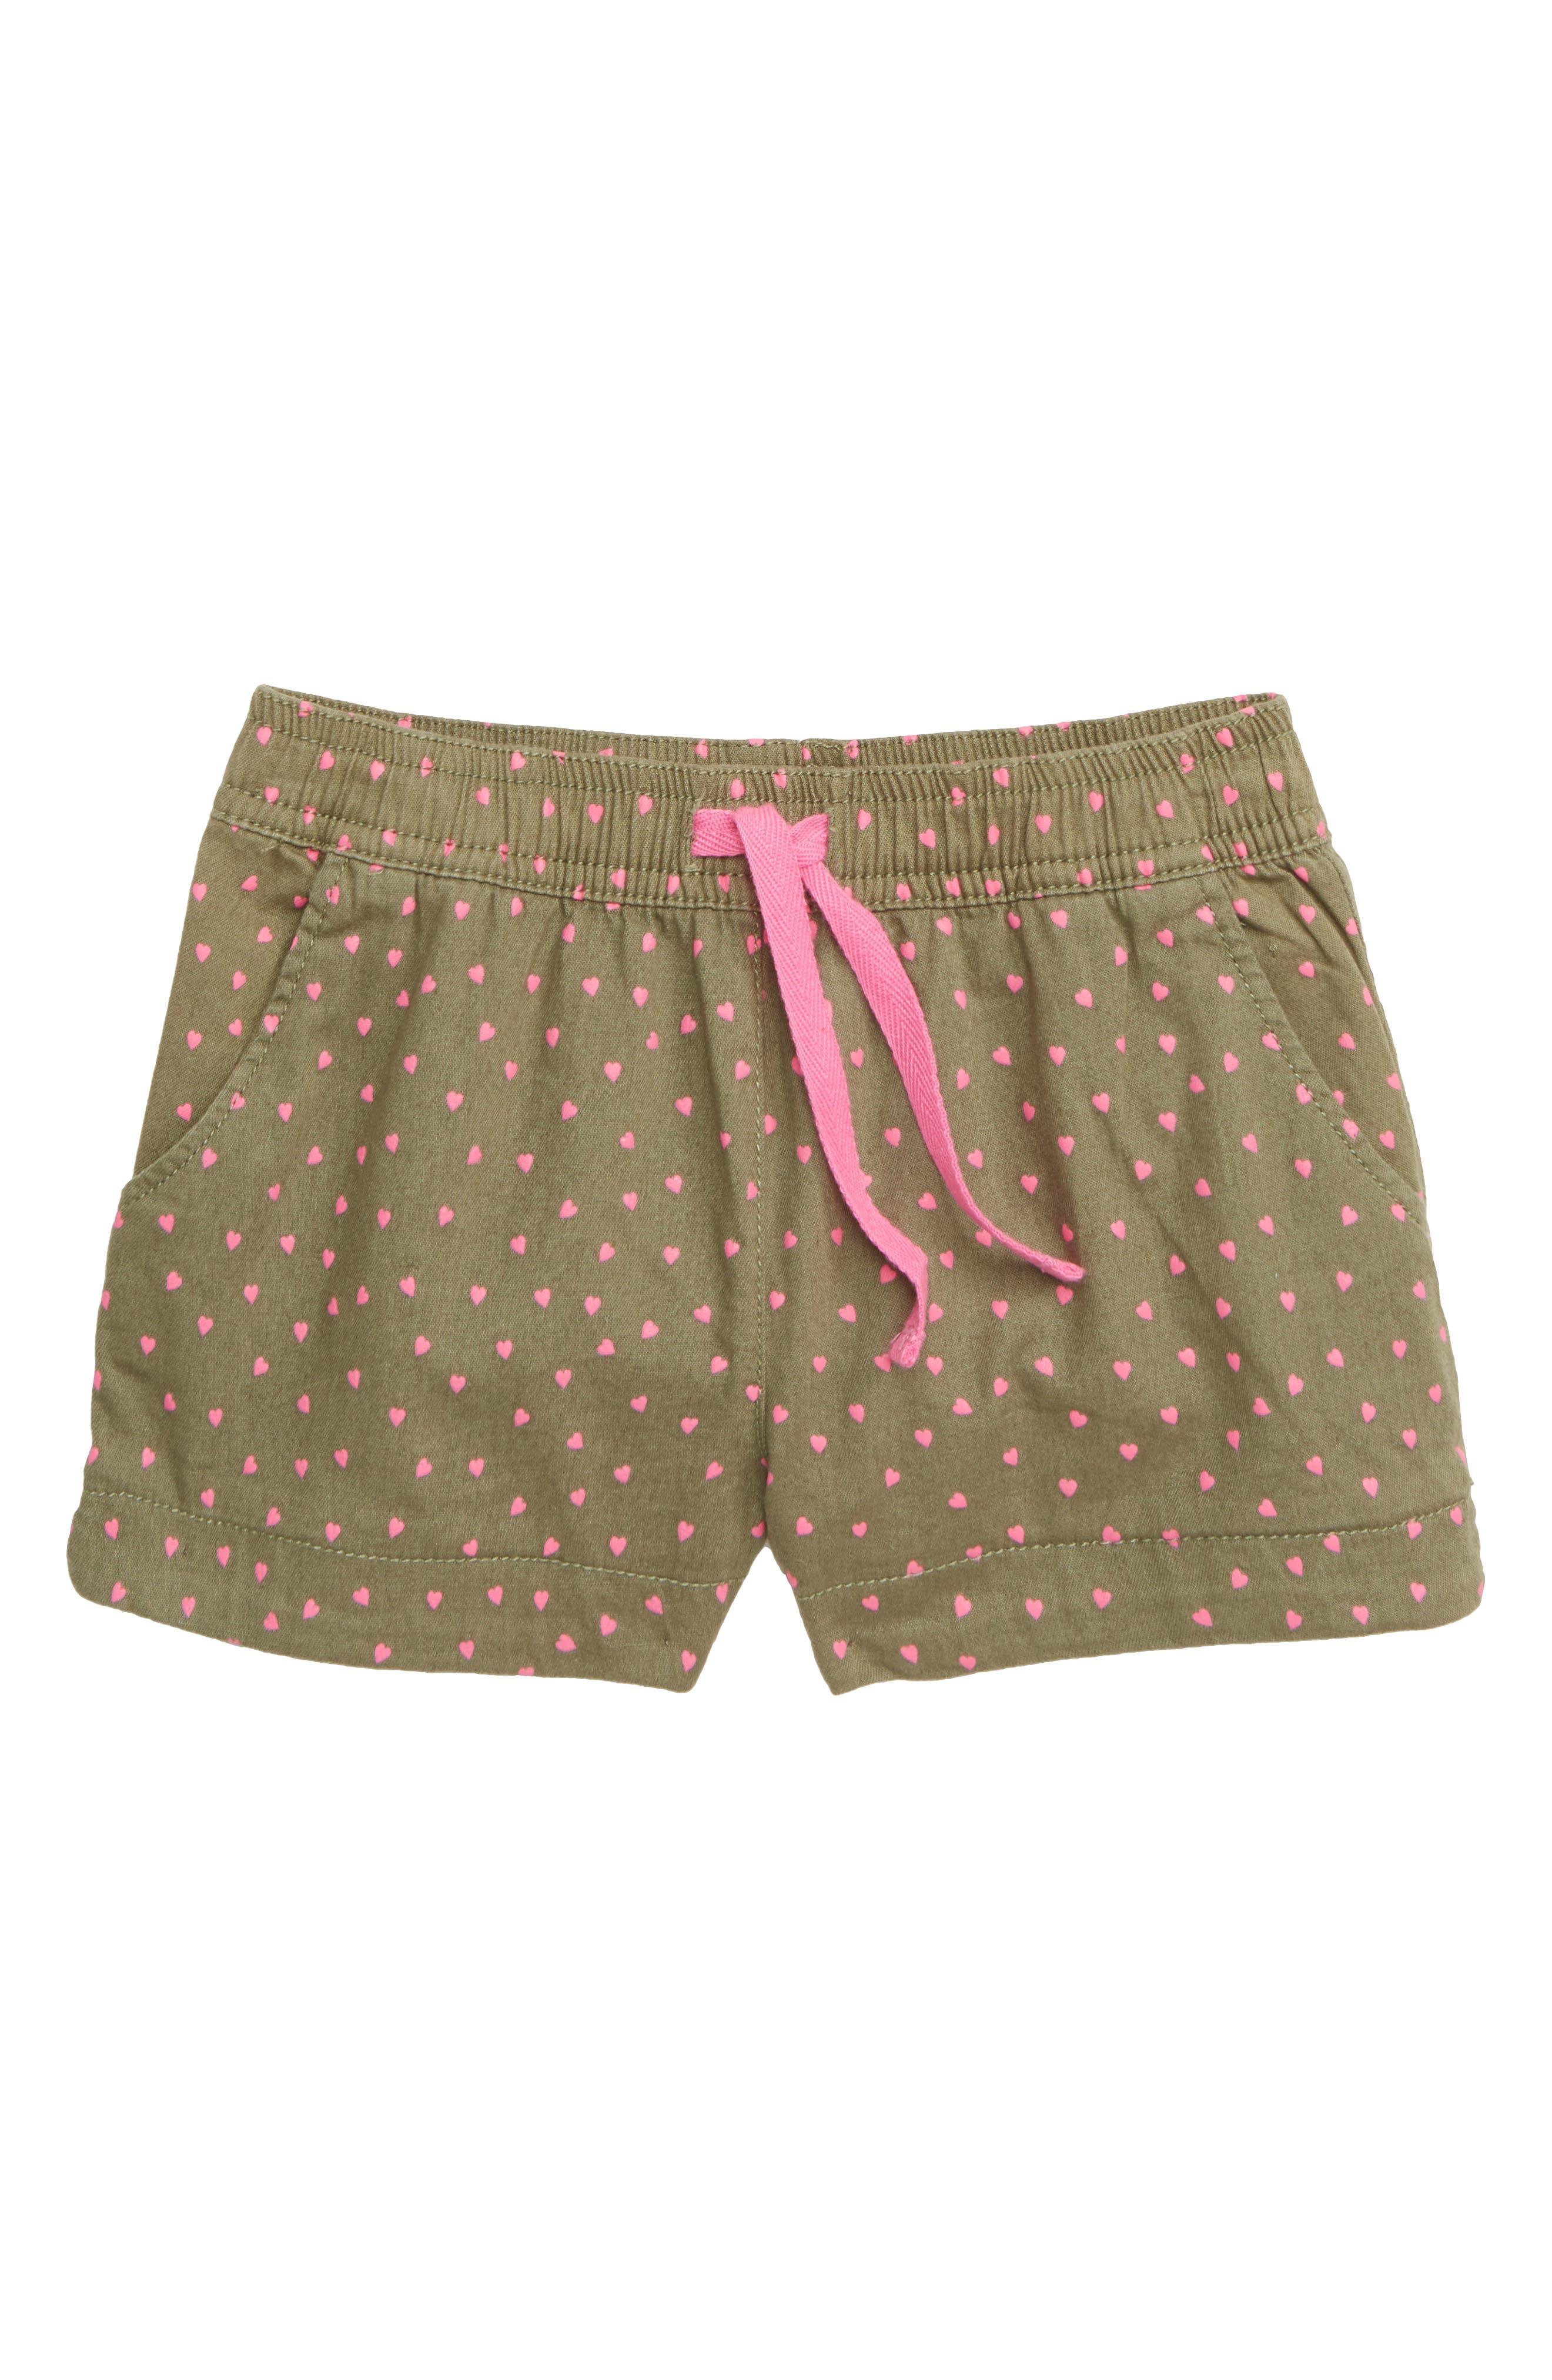 MINI BODEN Heart Pocket Shorts, Main, color, GRN ARMY GREEN SWEET HEARTS